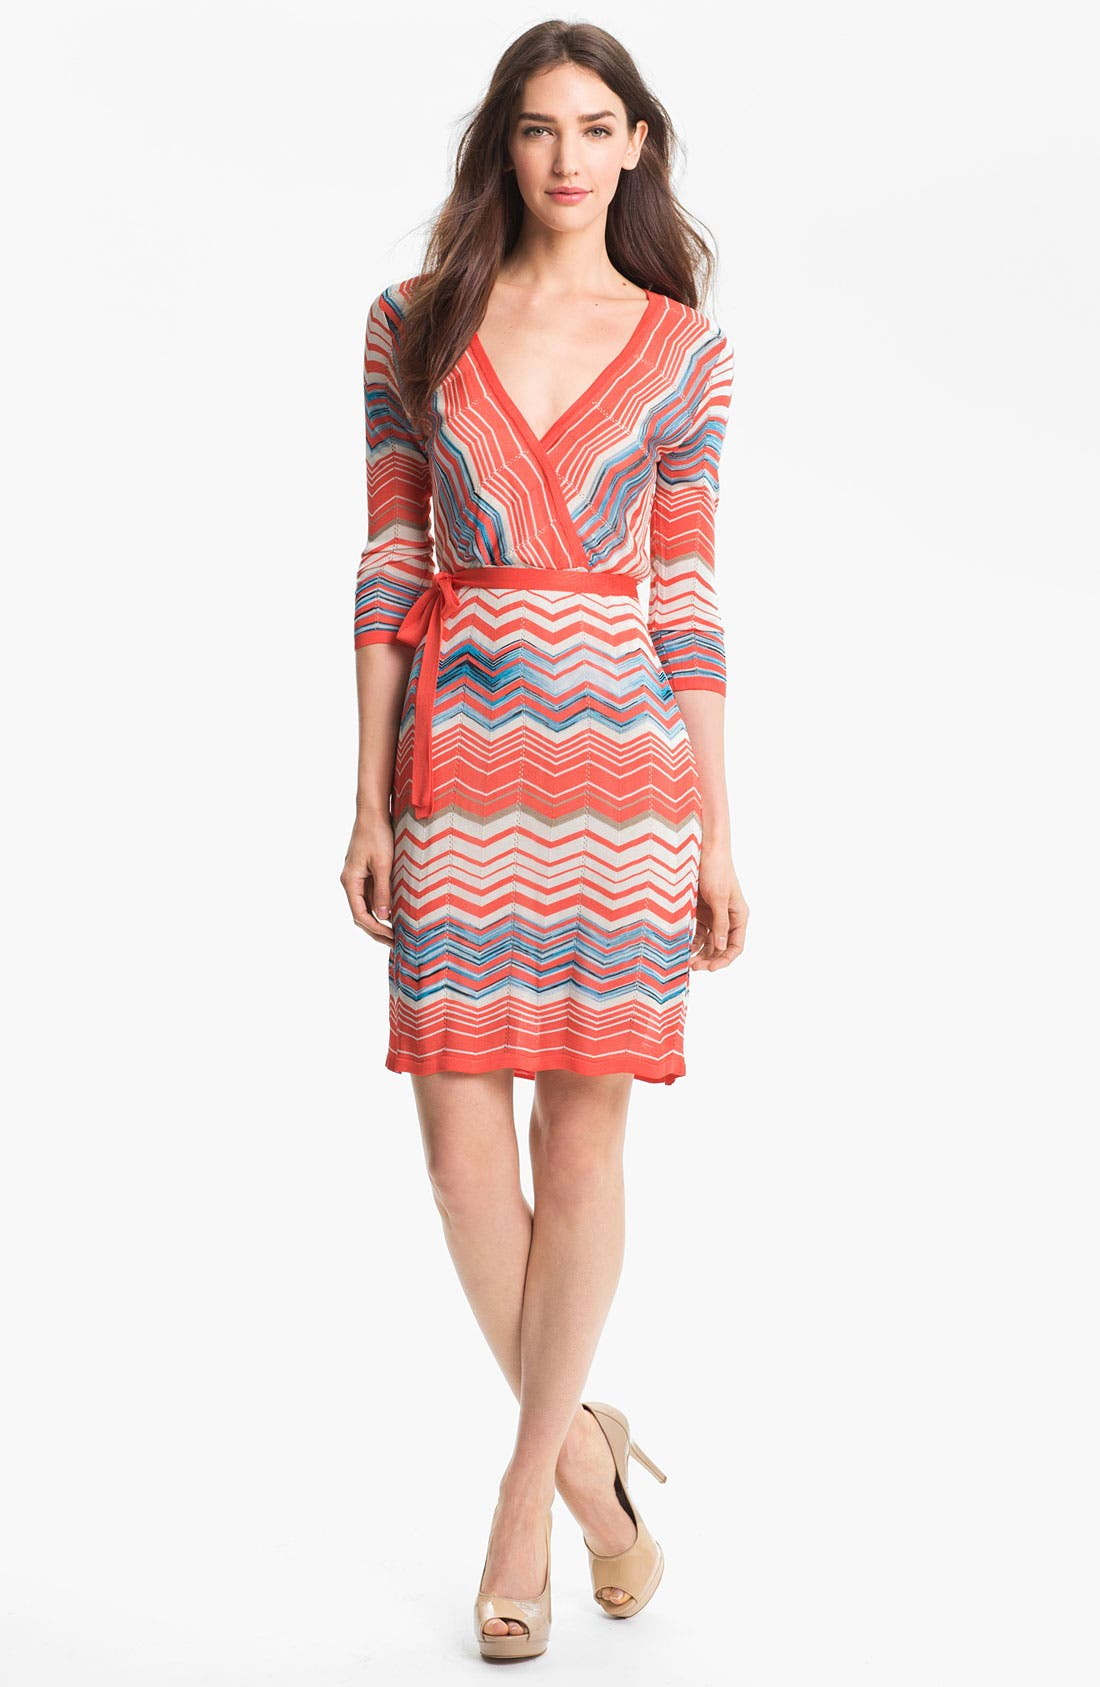 Alternate Image 1 Selected - Trina Turk 'Harbor' Faux Wrap Sweater Dress